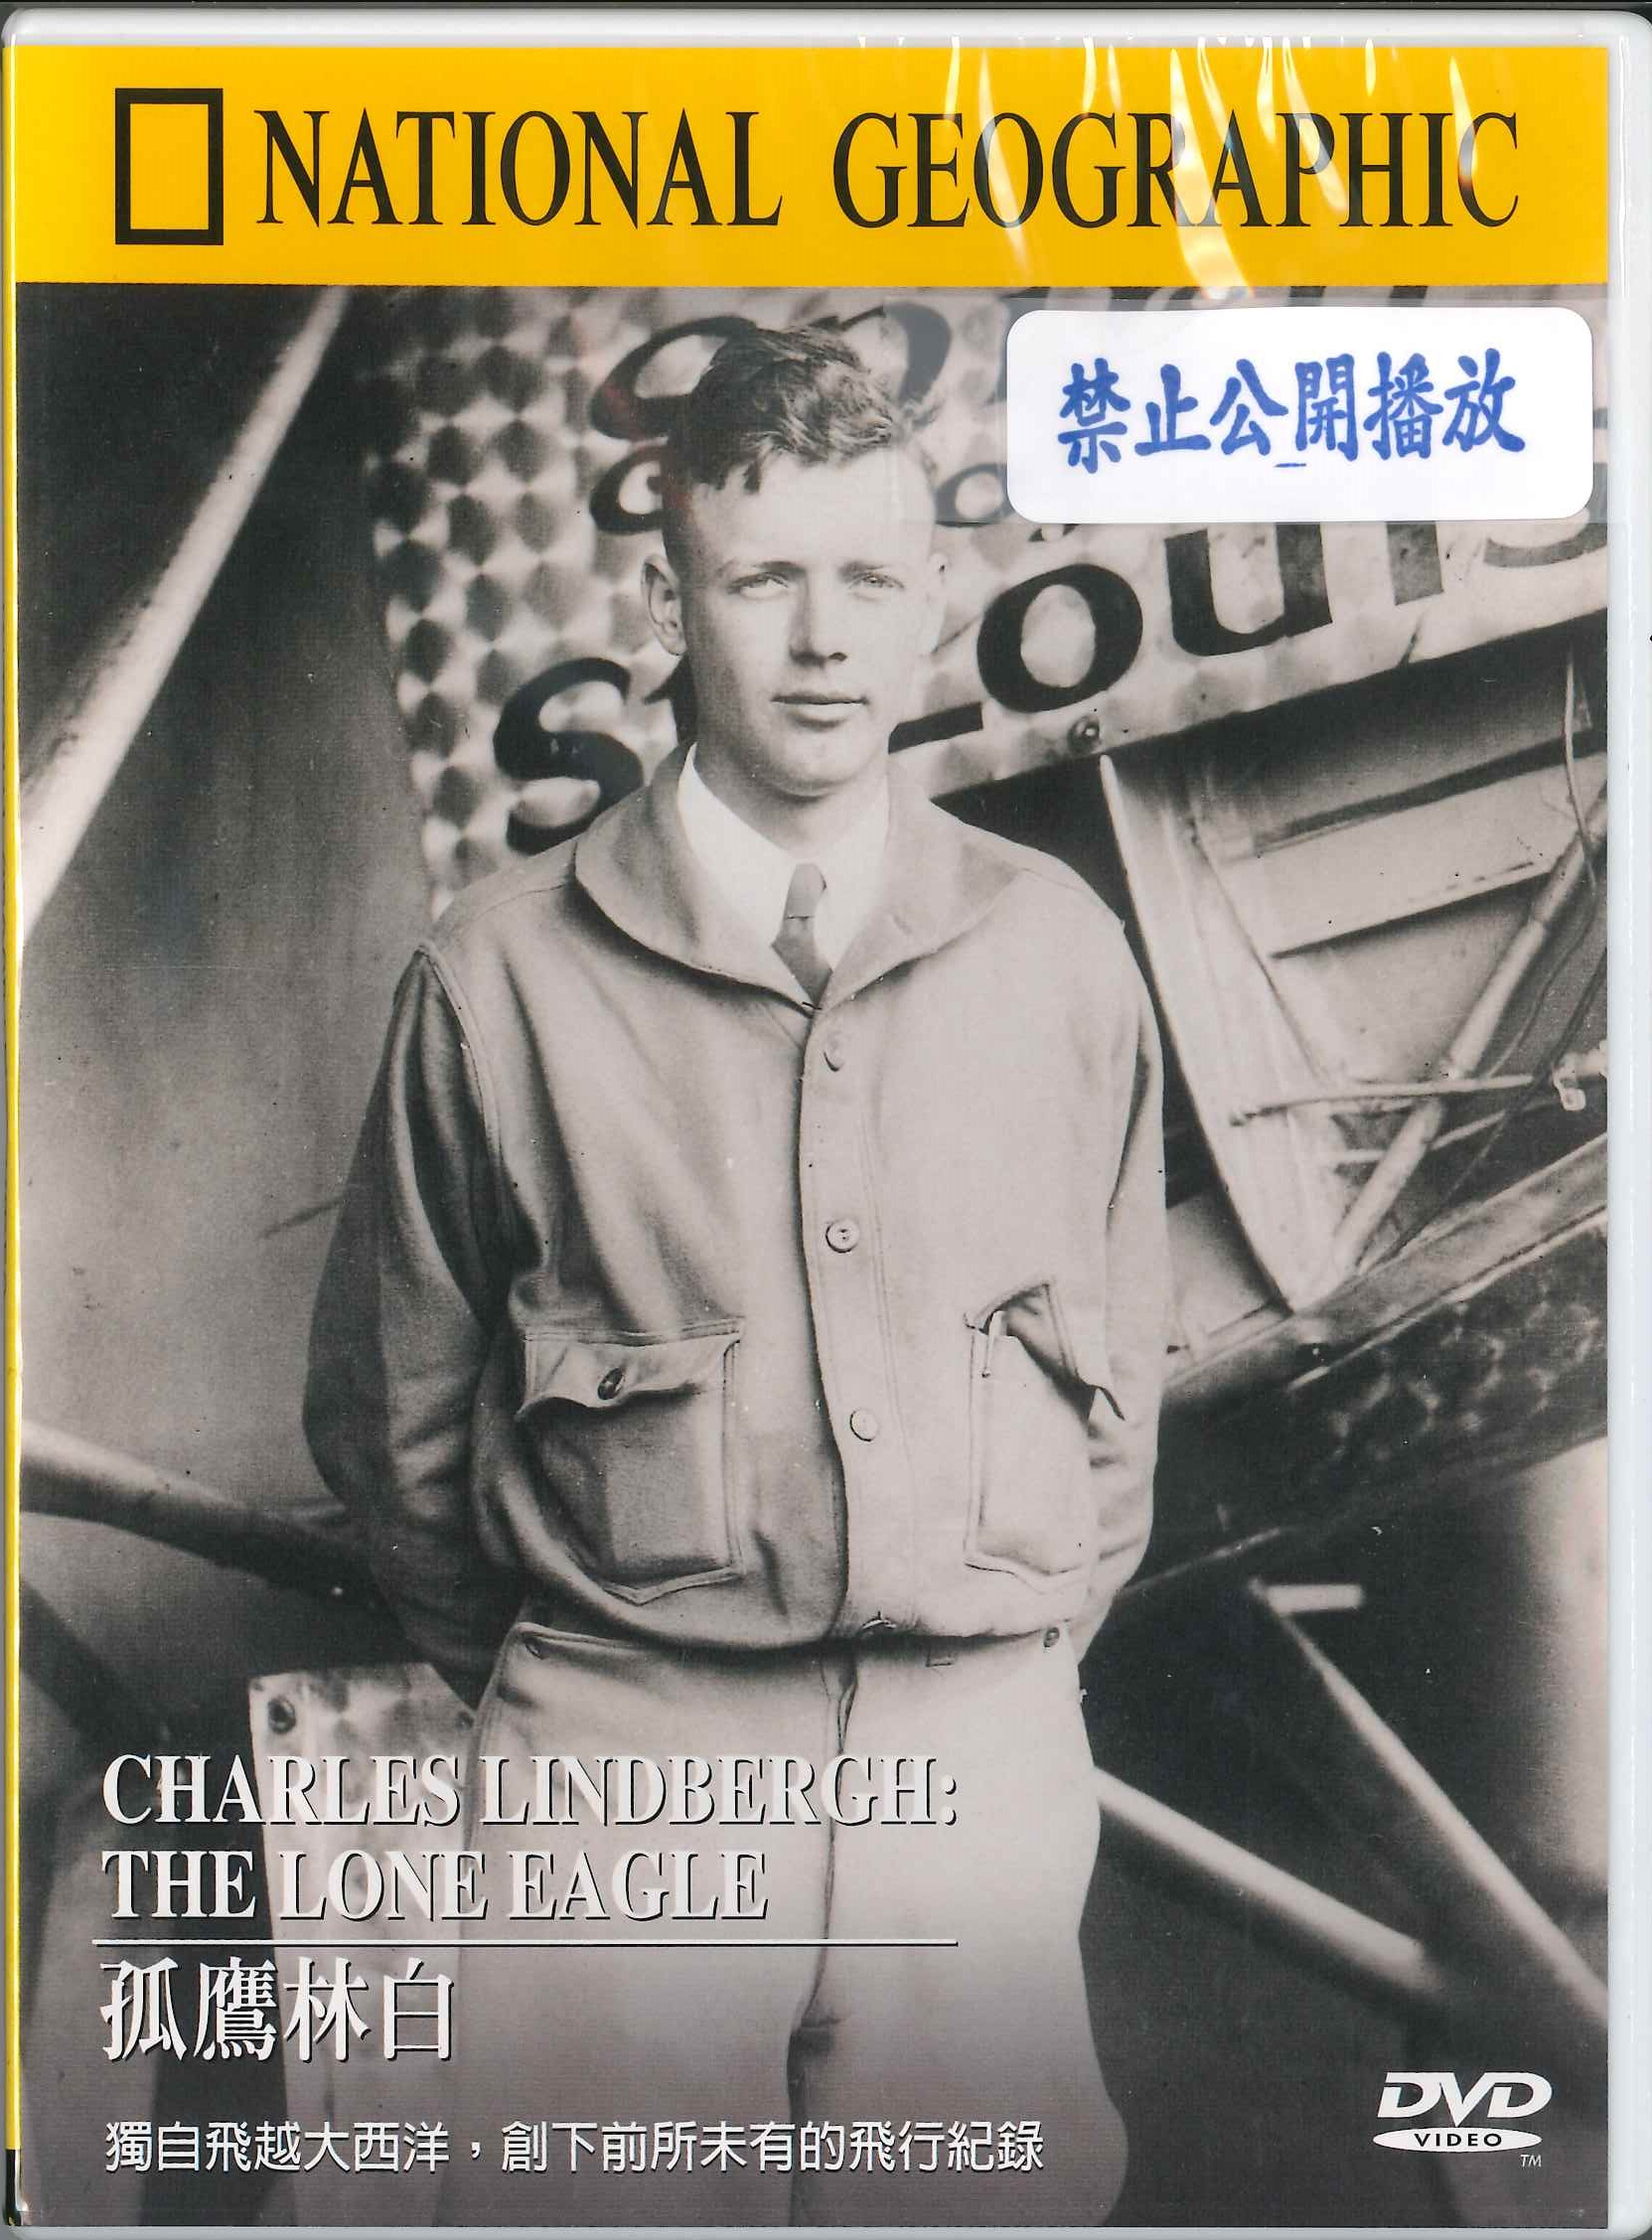 孤鷹林白 [錄影資料]=Charles Lindberch: the lone eagle